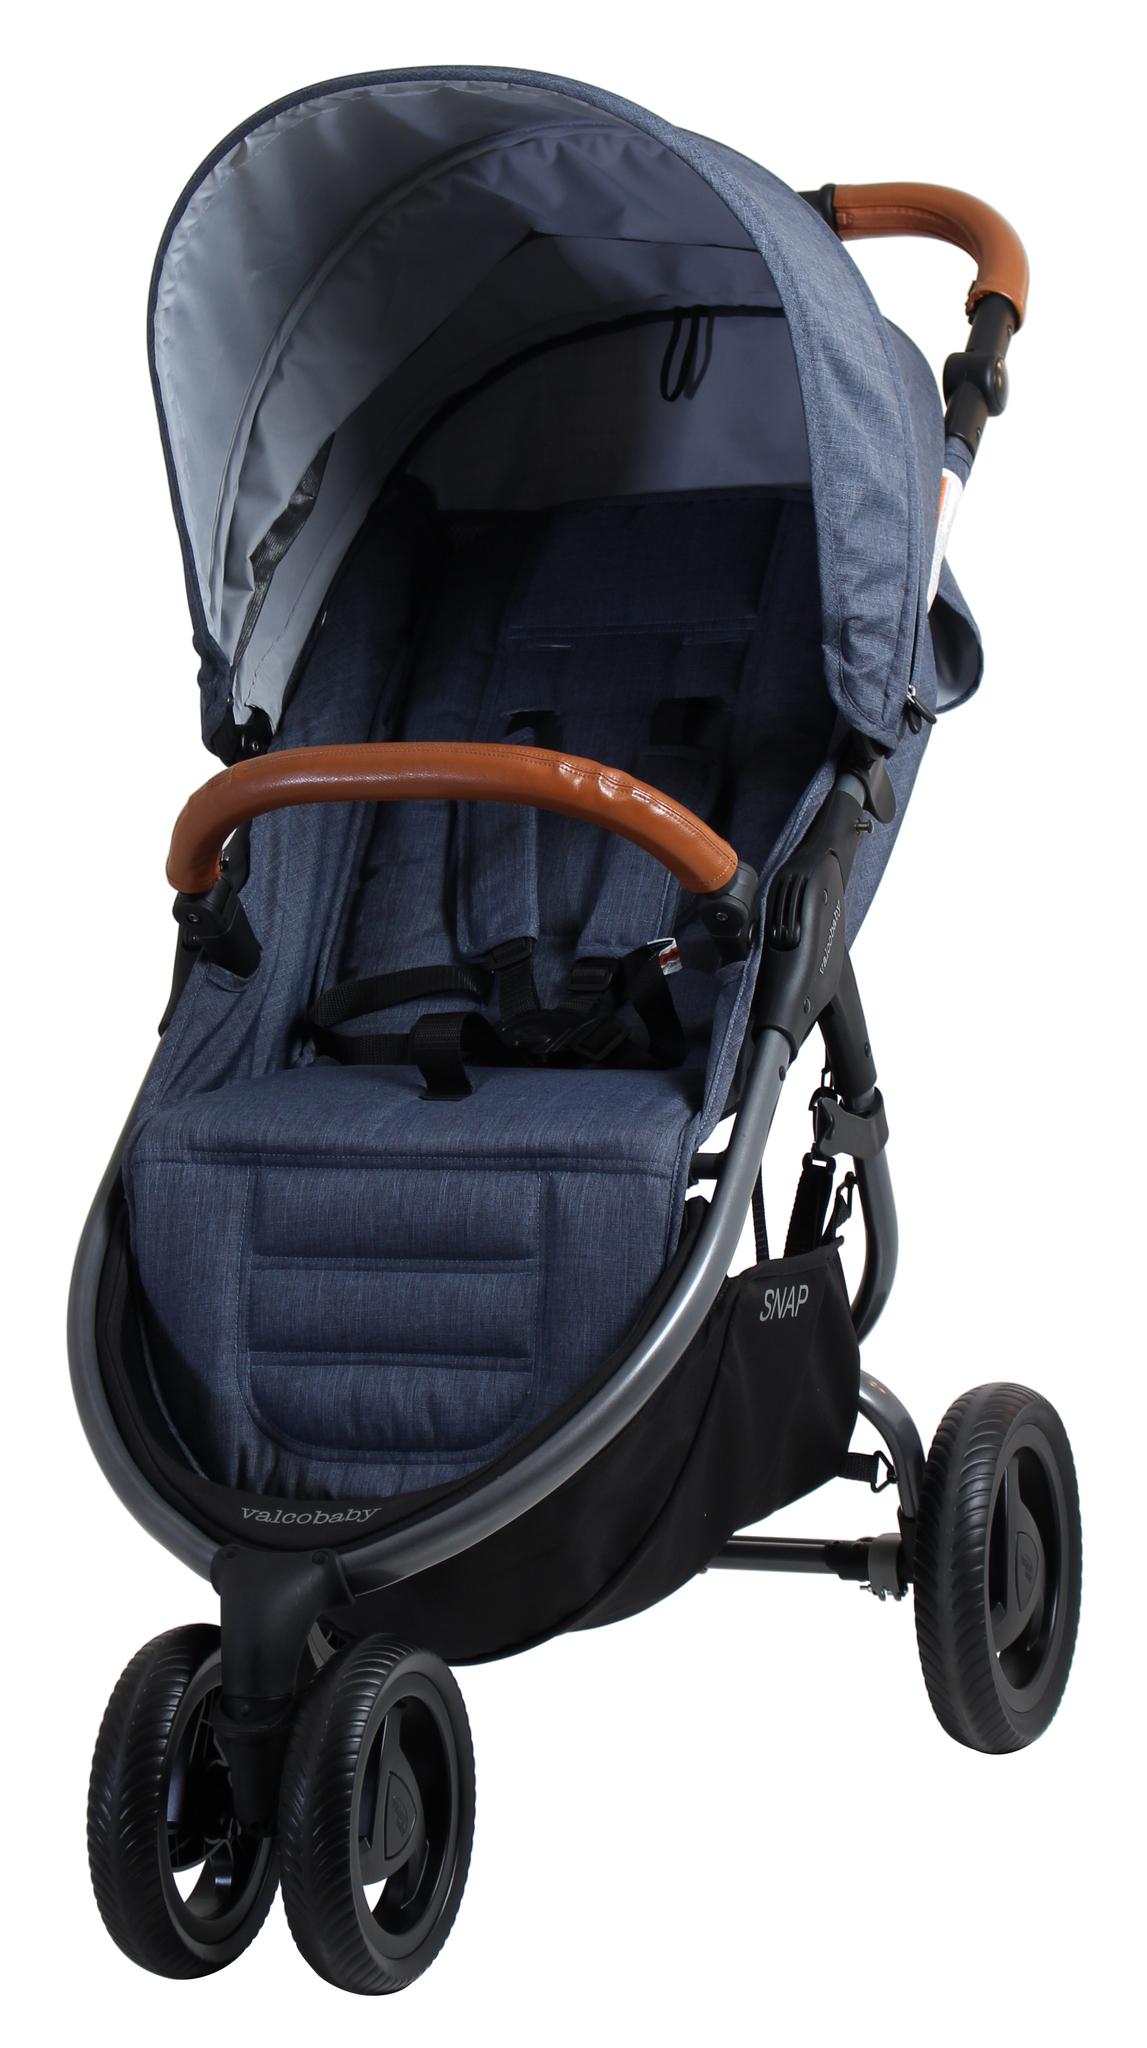 Прогулочная коляска Valco baby Snap Trend 3 / Denim